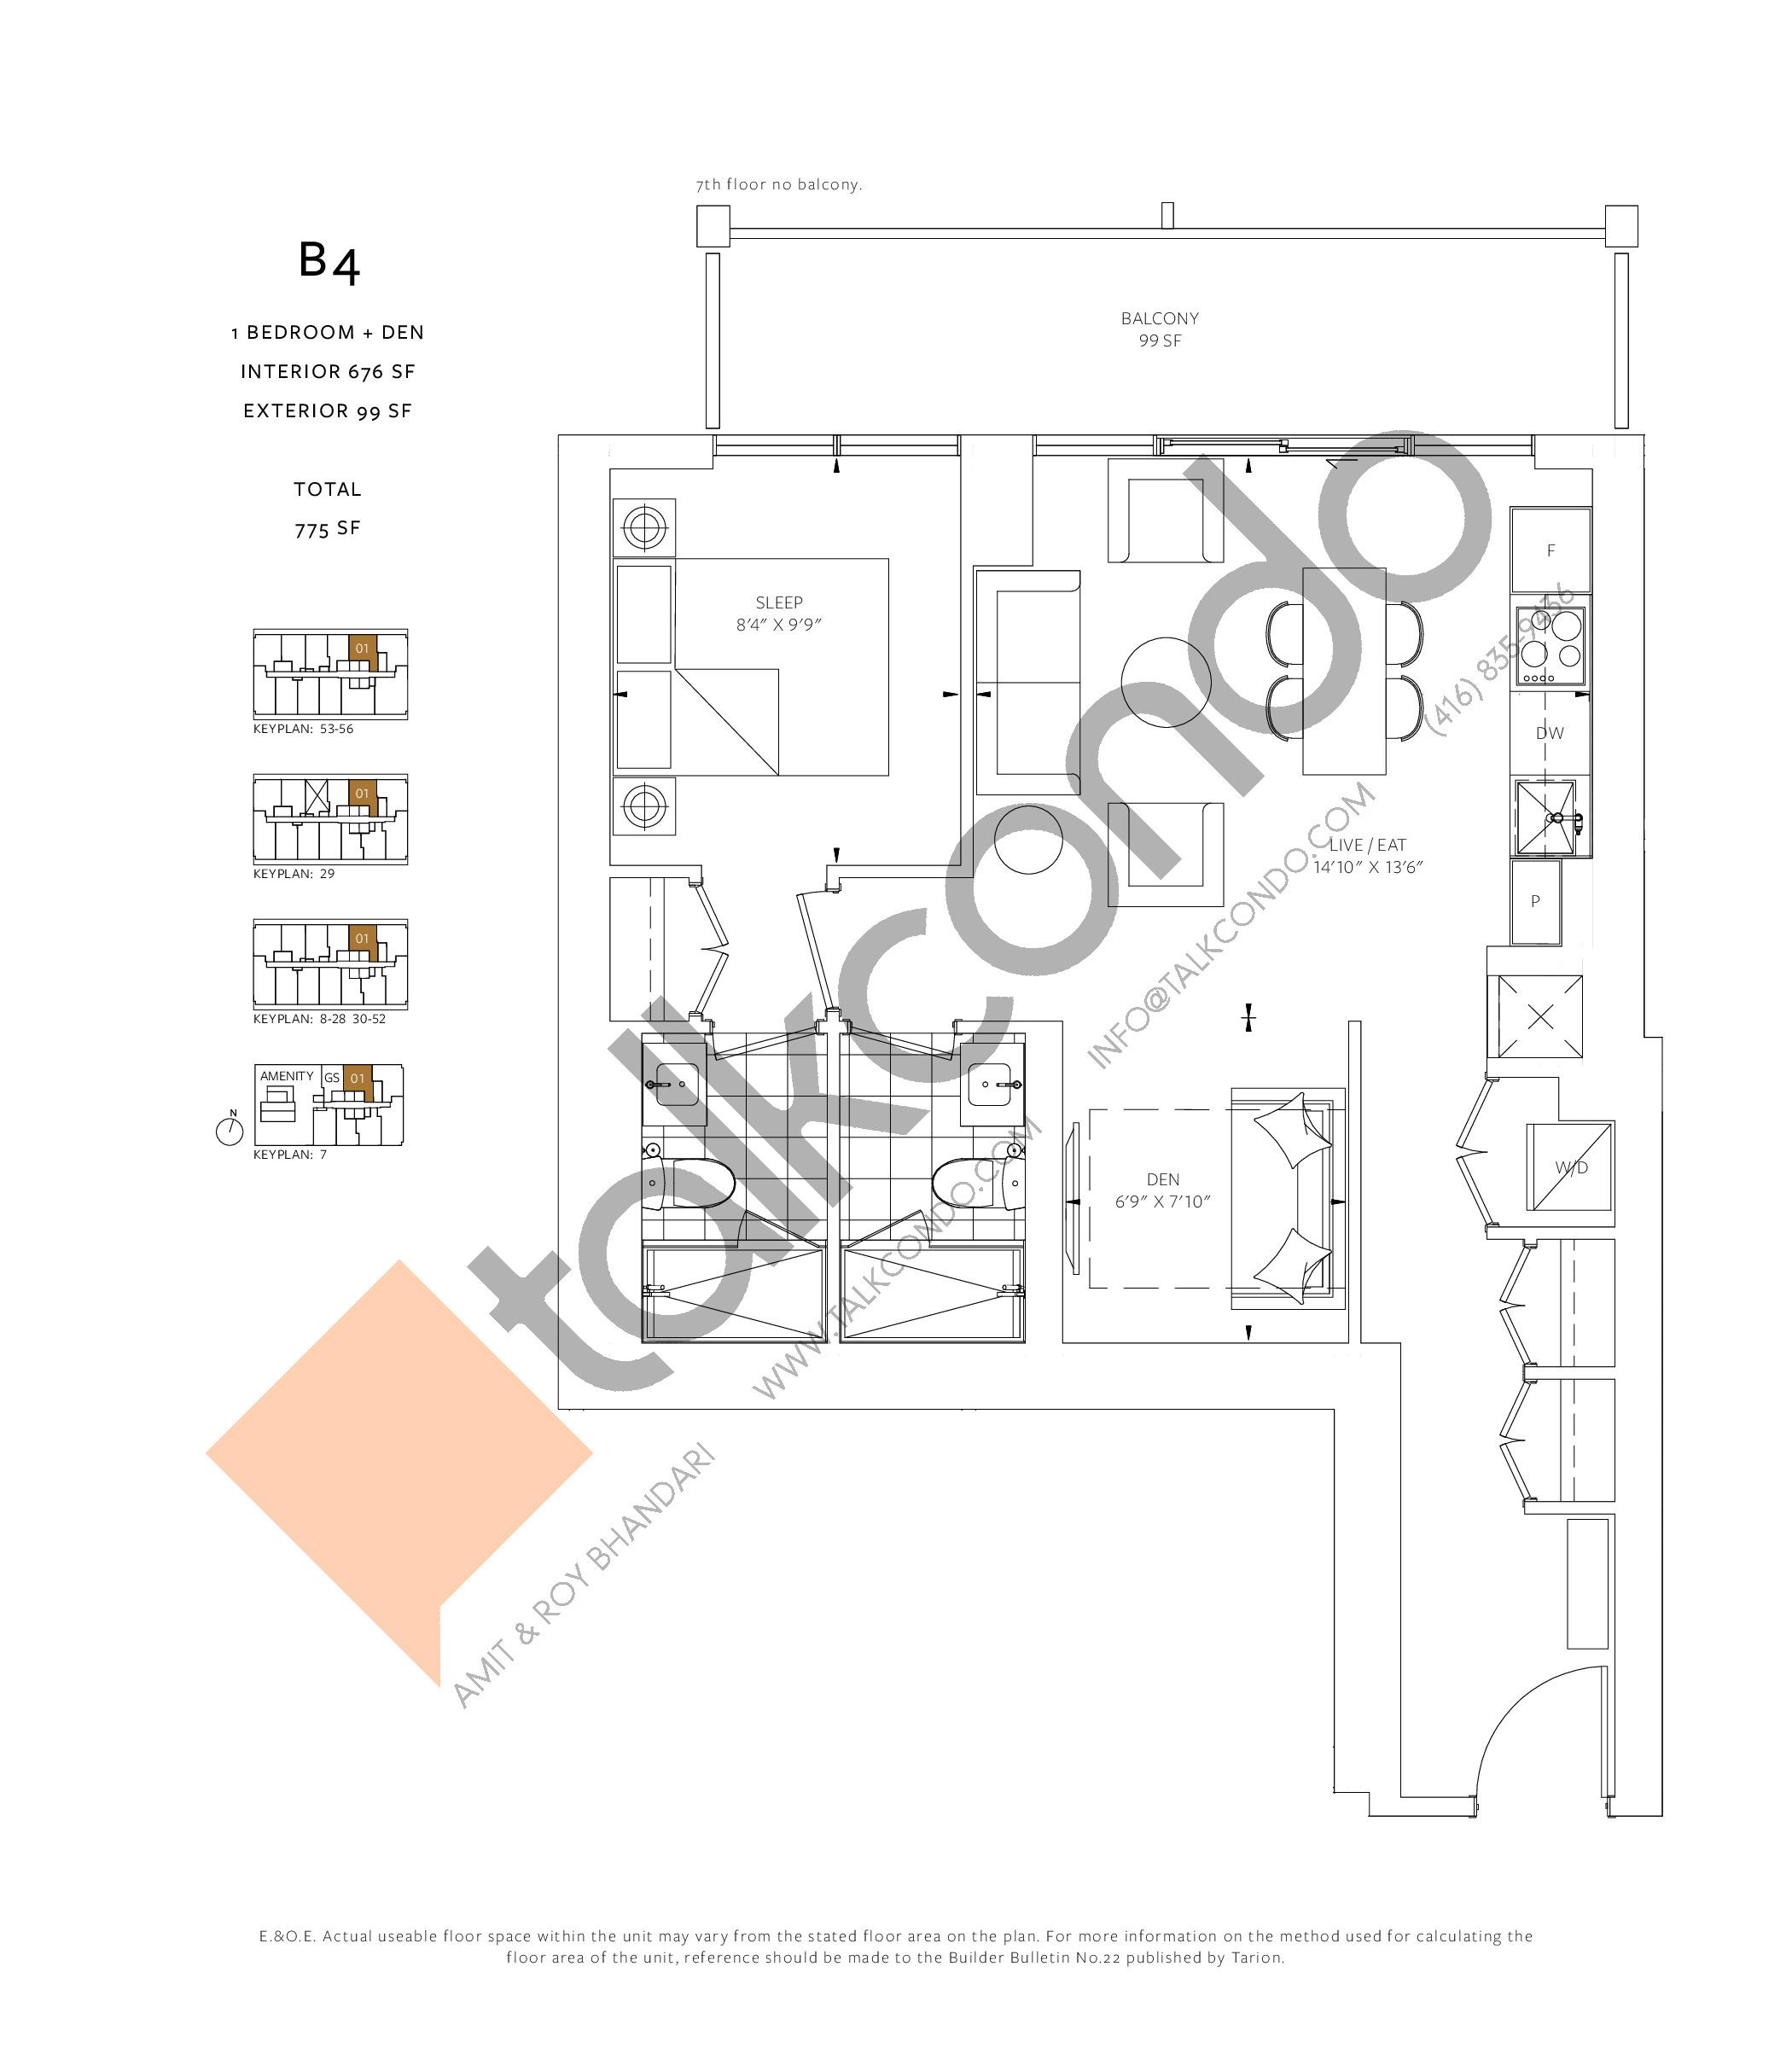 B4 Floor Plan at 88 Queen Condos - 676 sq.ft